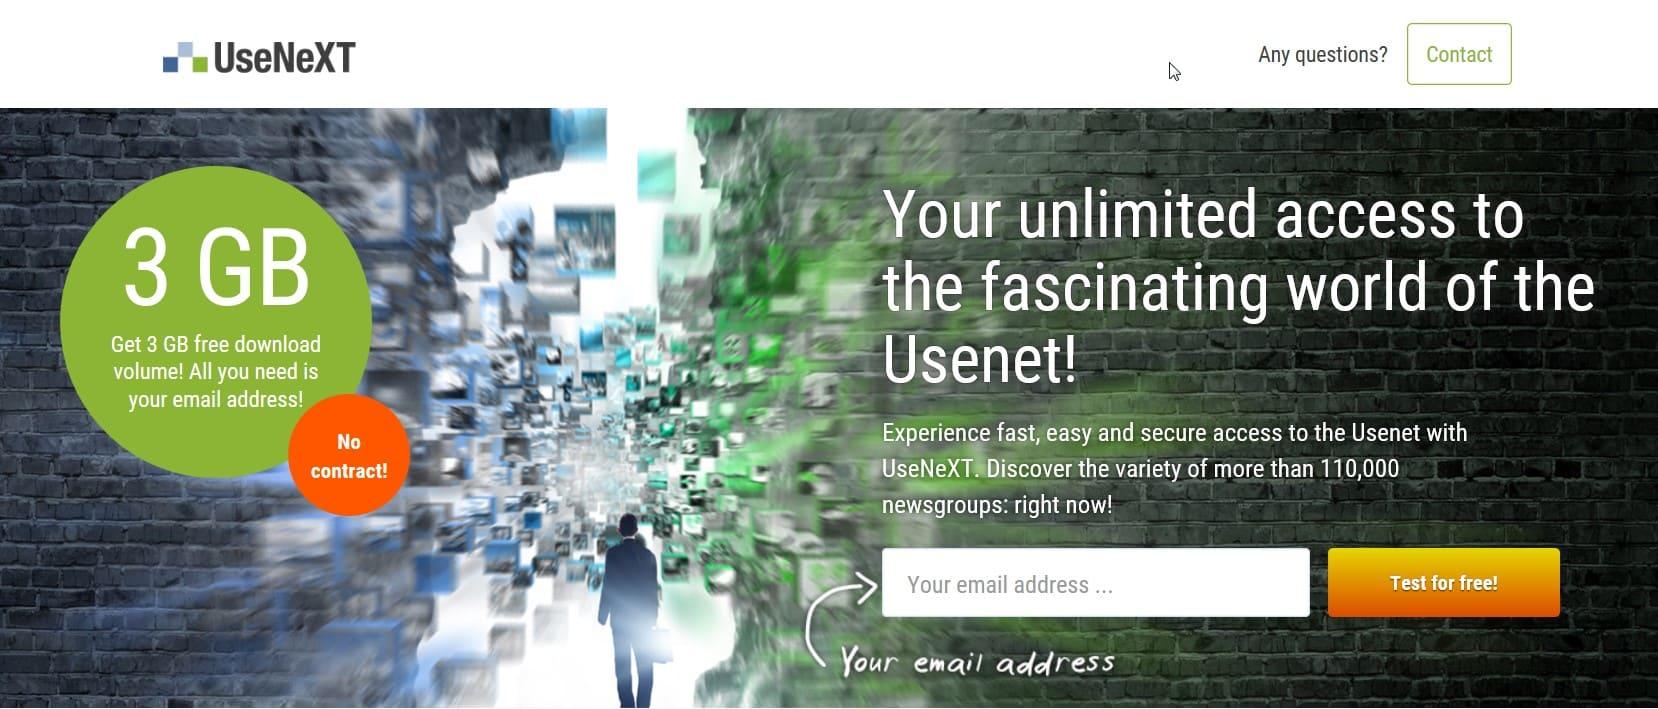 UseNeXT - Download